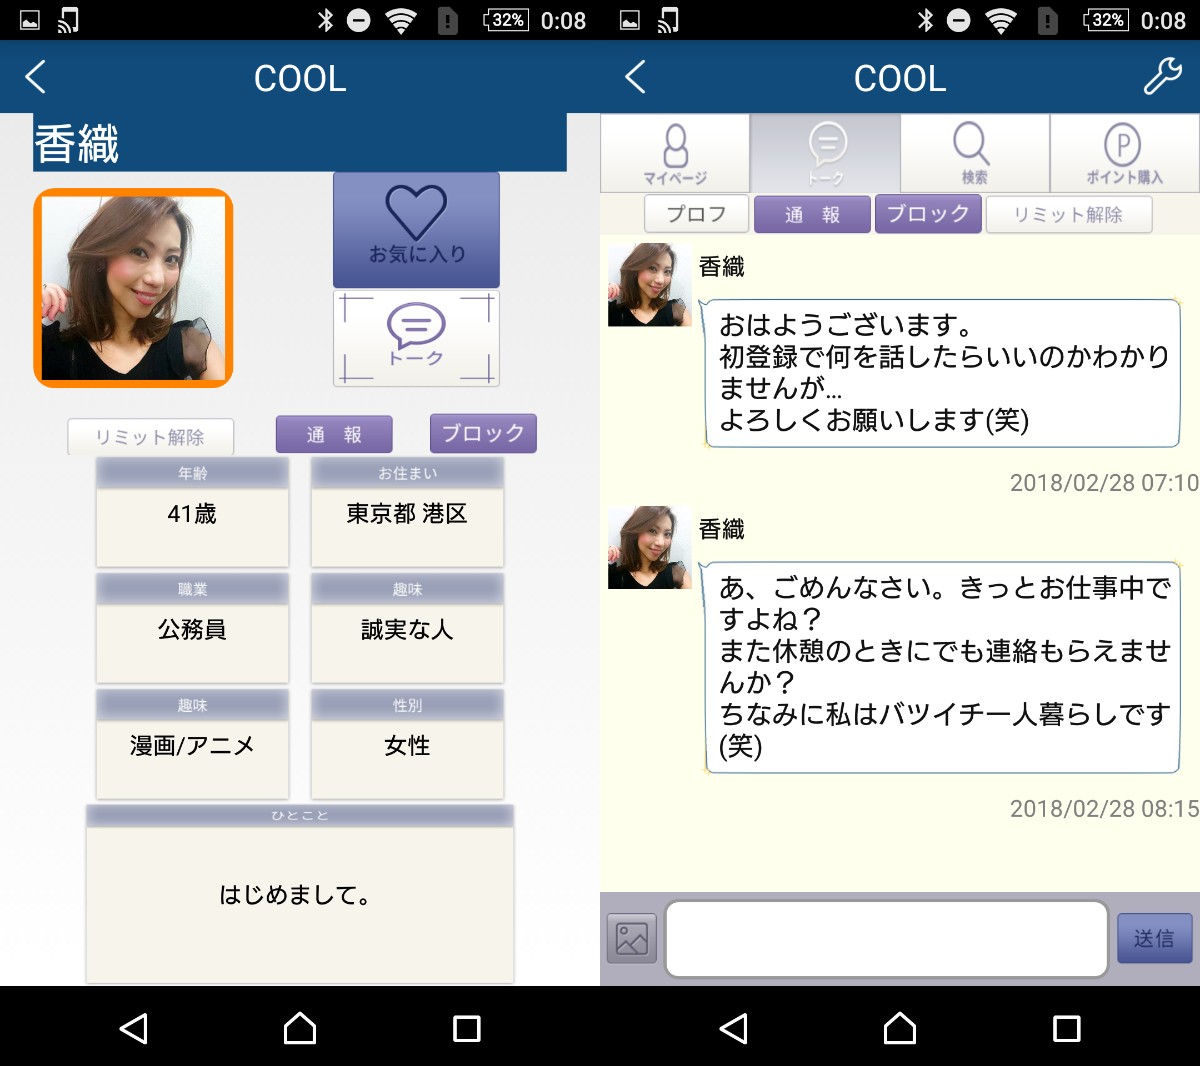 COOL-大人トークアプリ-サクラ